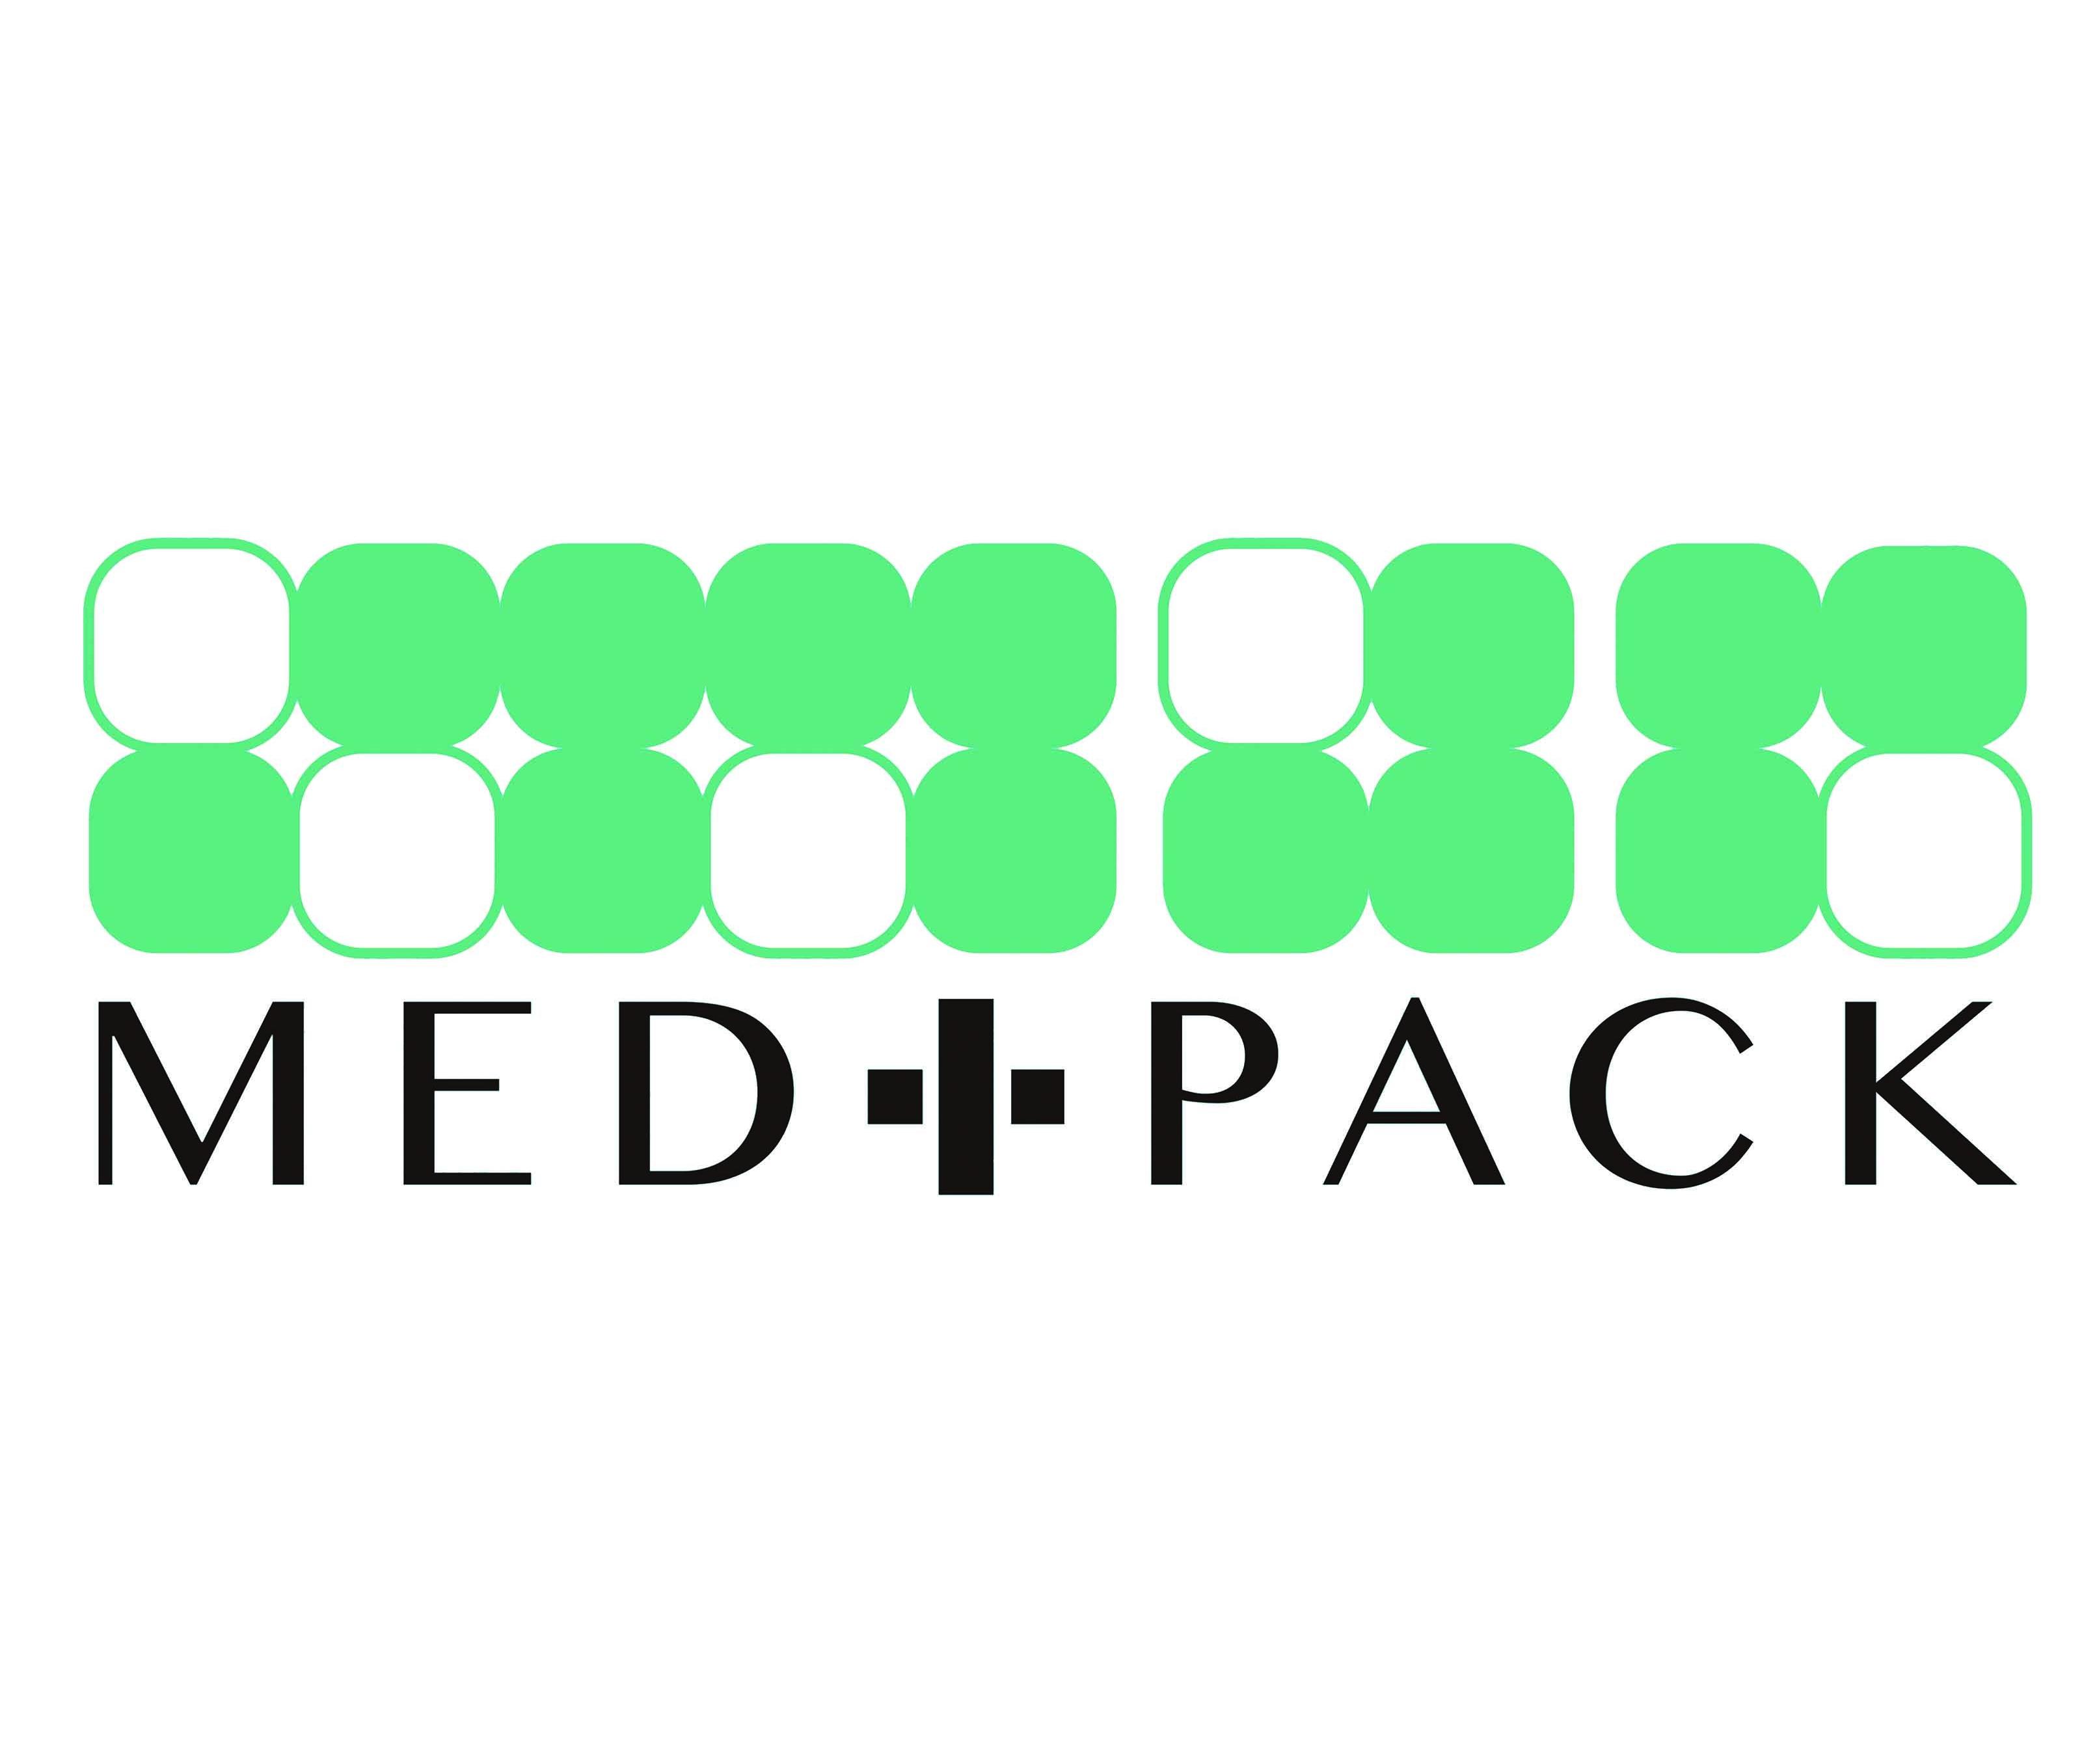 Medipack Medical Packaging Mfg. Co.